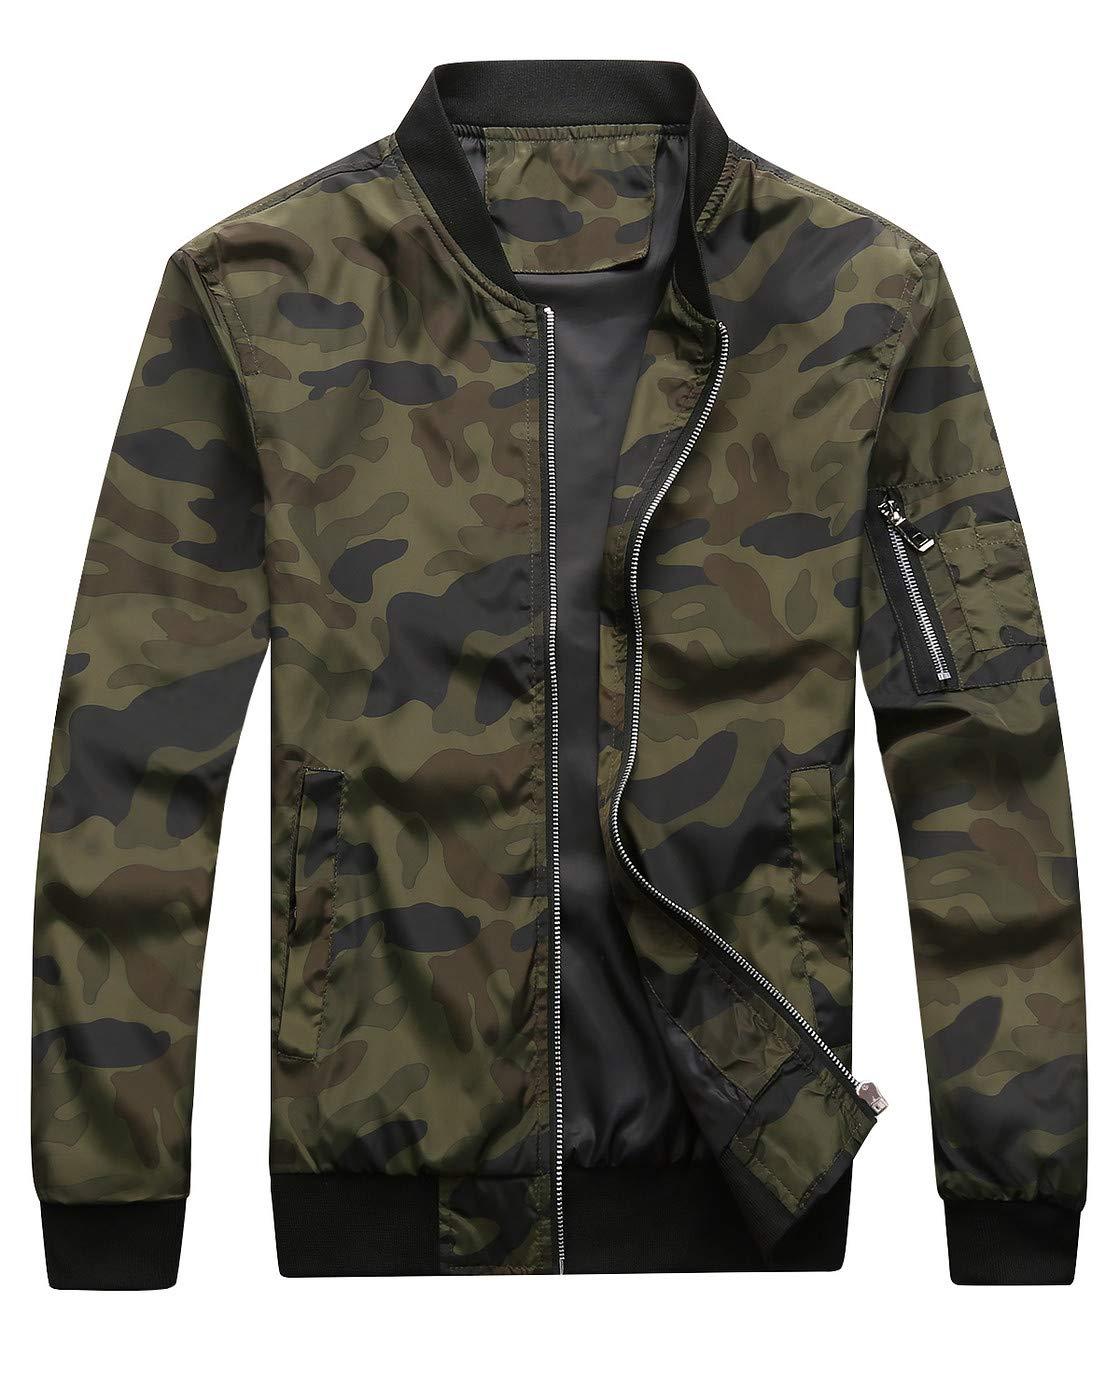 Fairylinks Bomber Jacket Men Camo Print Outwear, Army, Large by Fairylinks